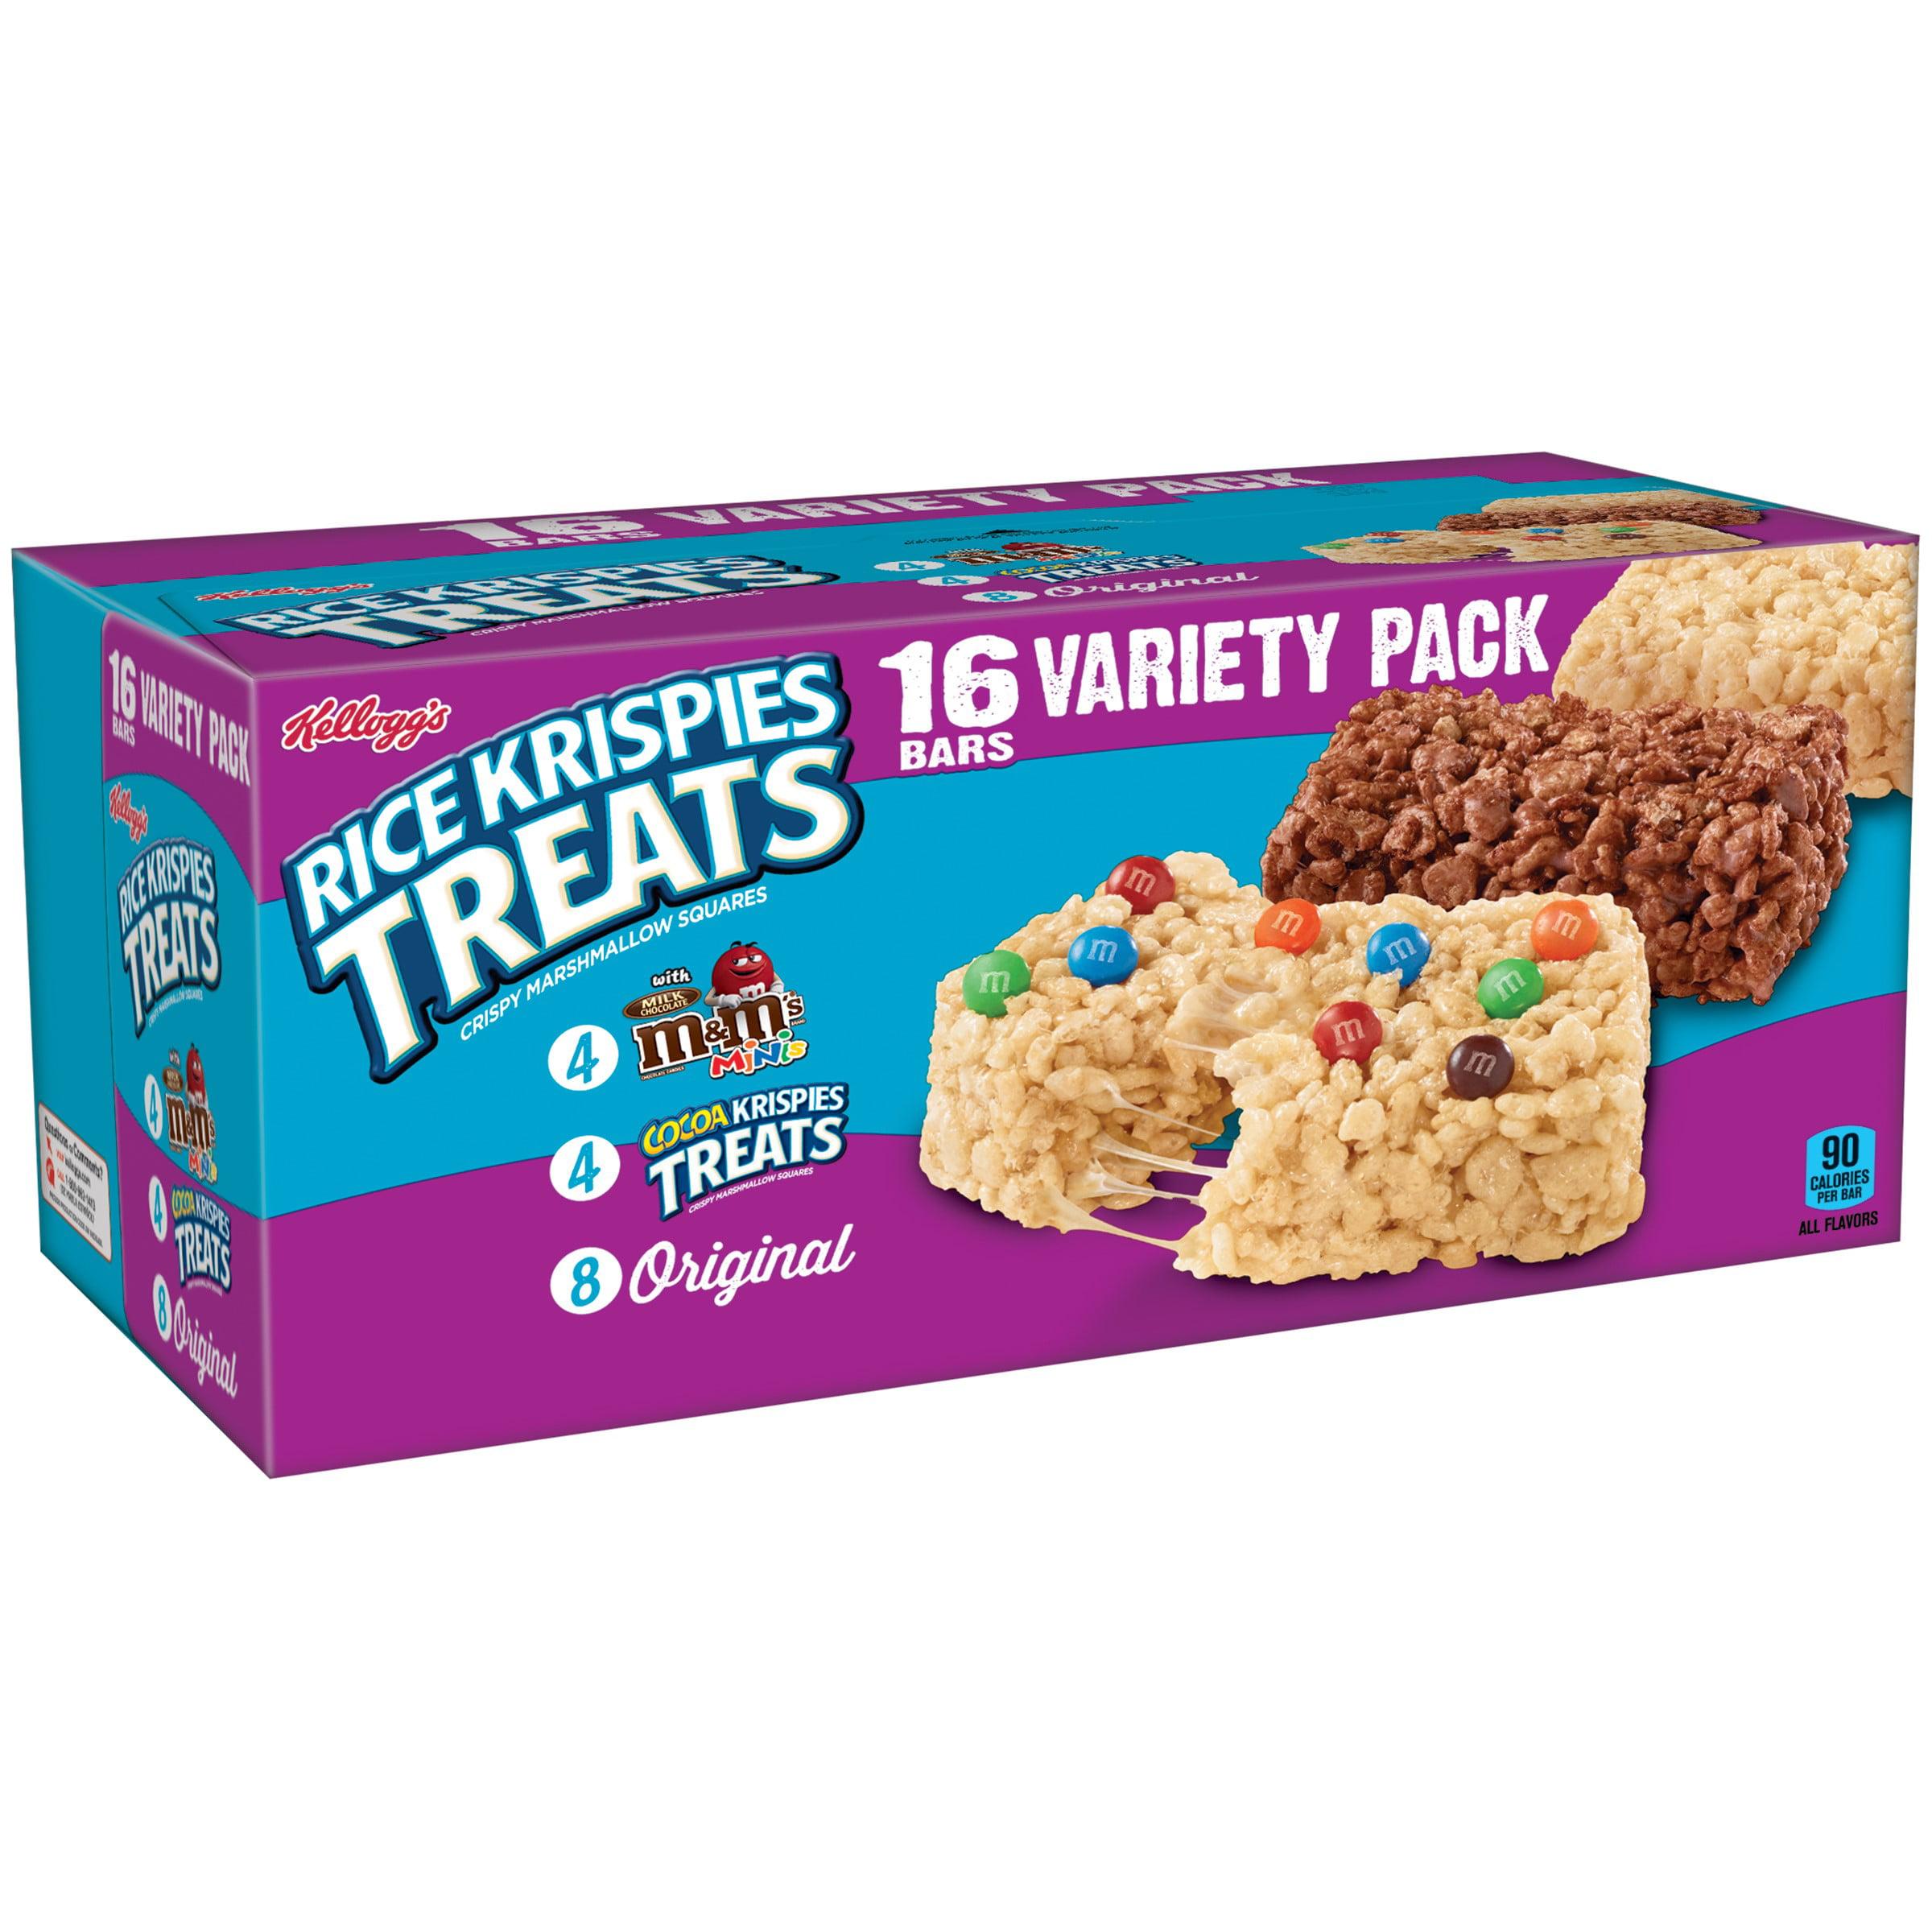 Kellogg's Rice Krispies Treats Variety Pack, 0.78 oz, 16 count